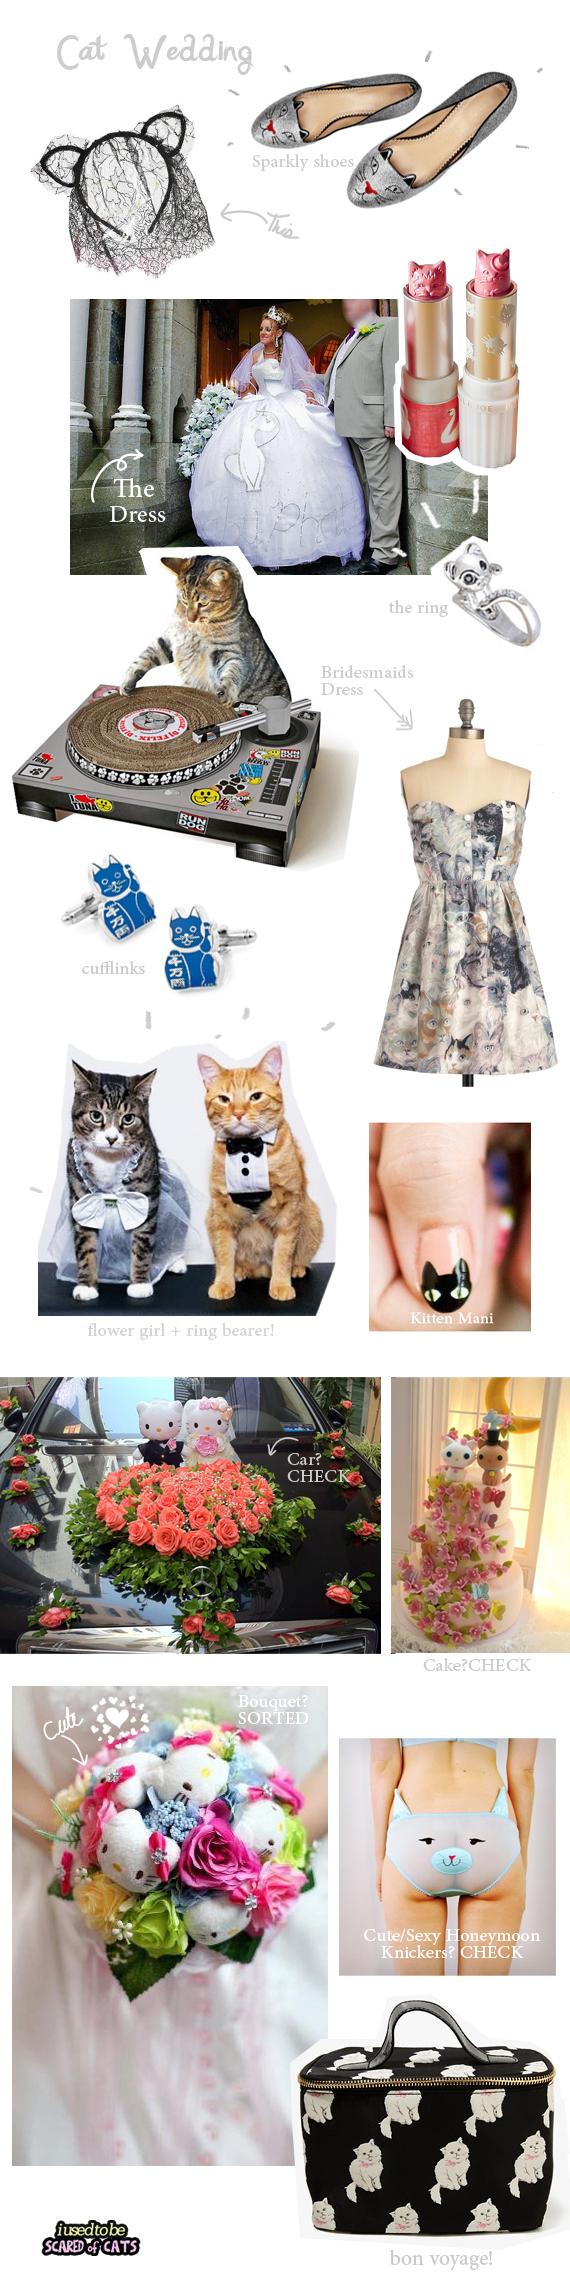 cat themed wedding